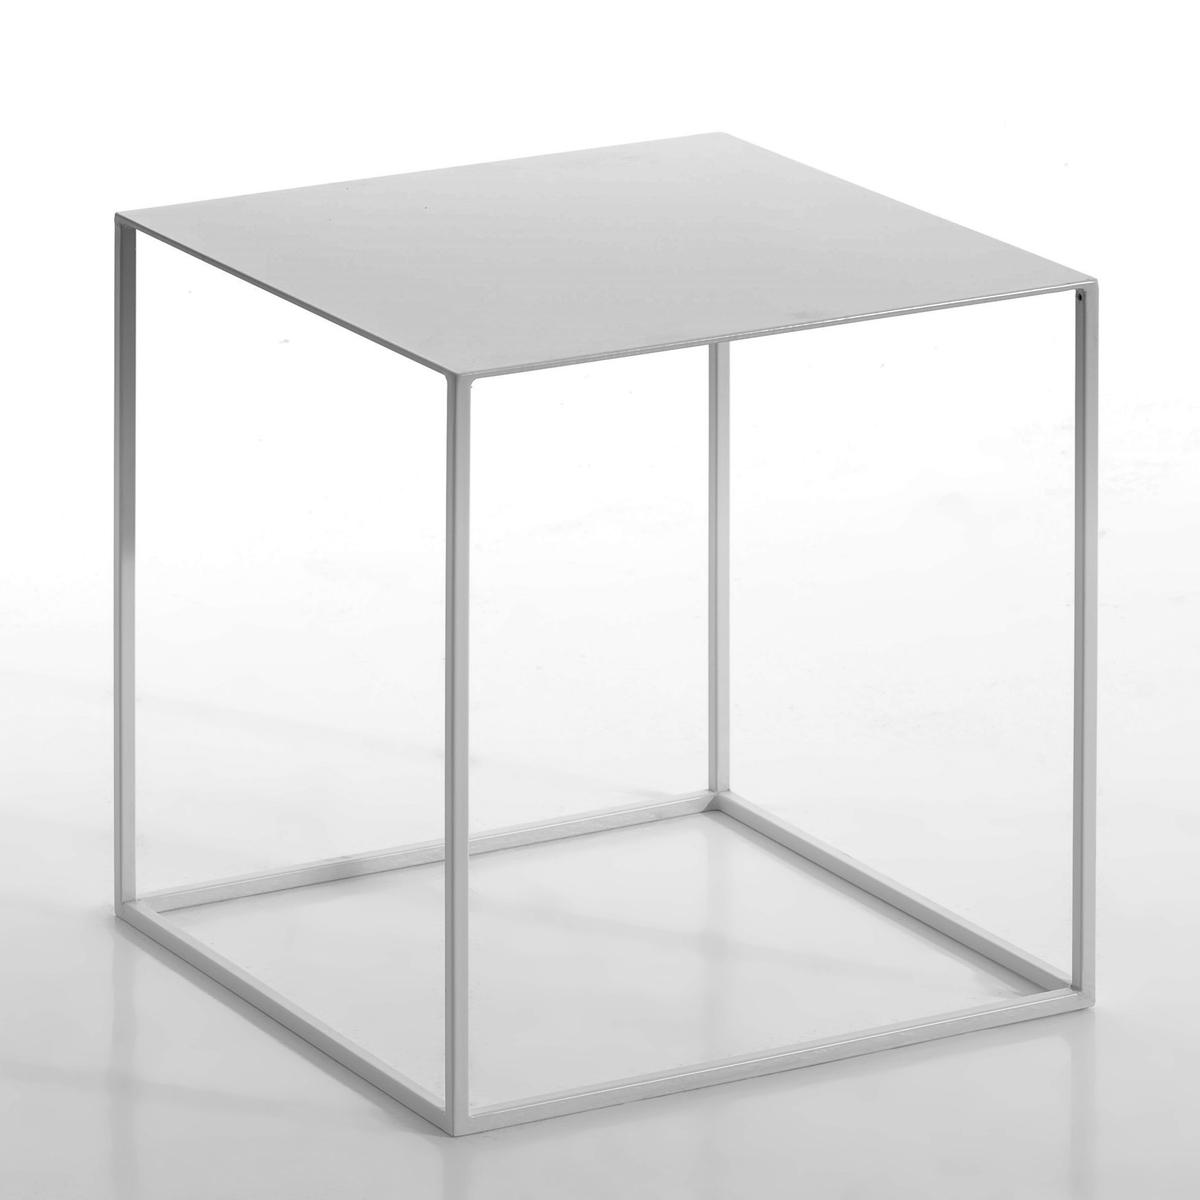 Столик из лакированного металла, Romy от La Redoute